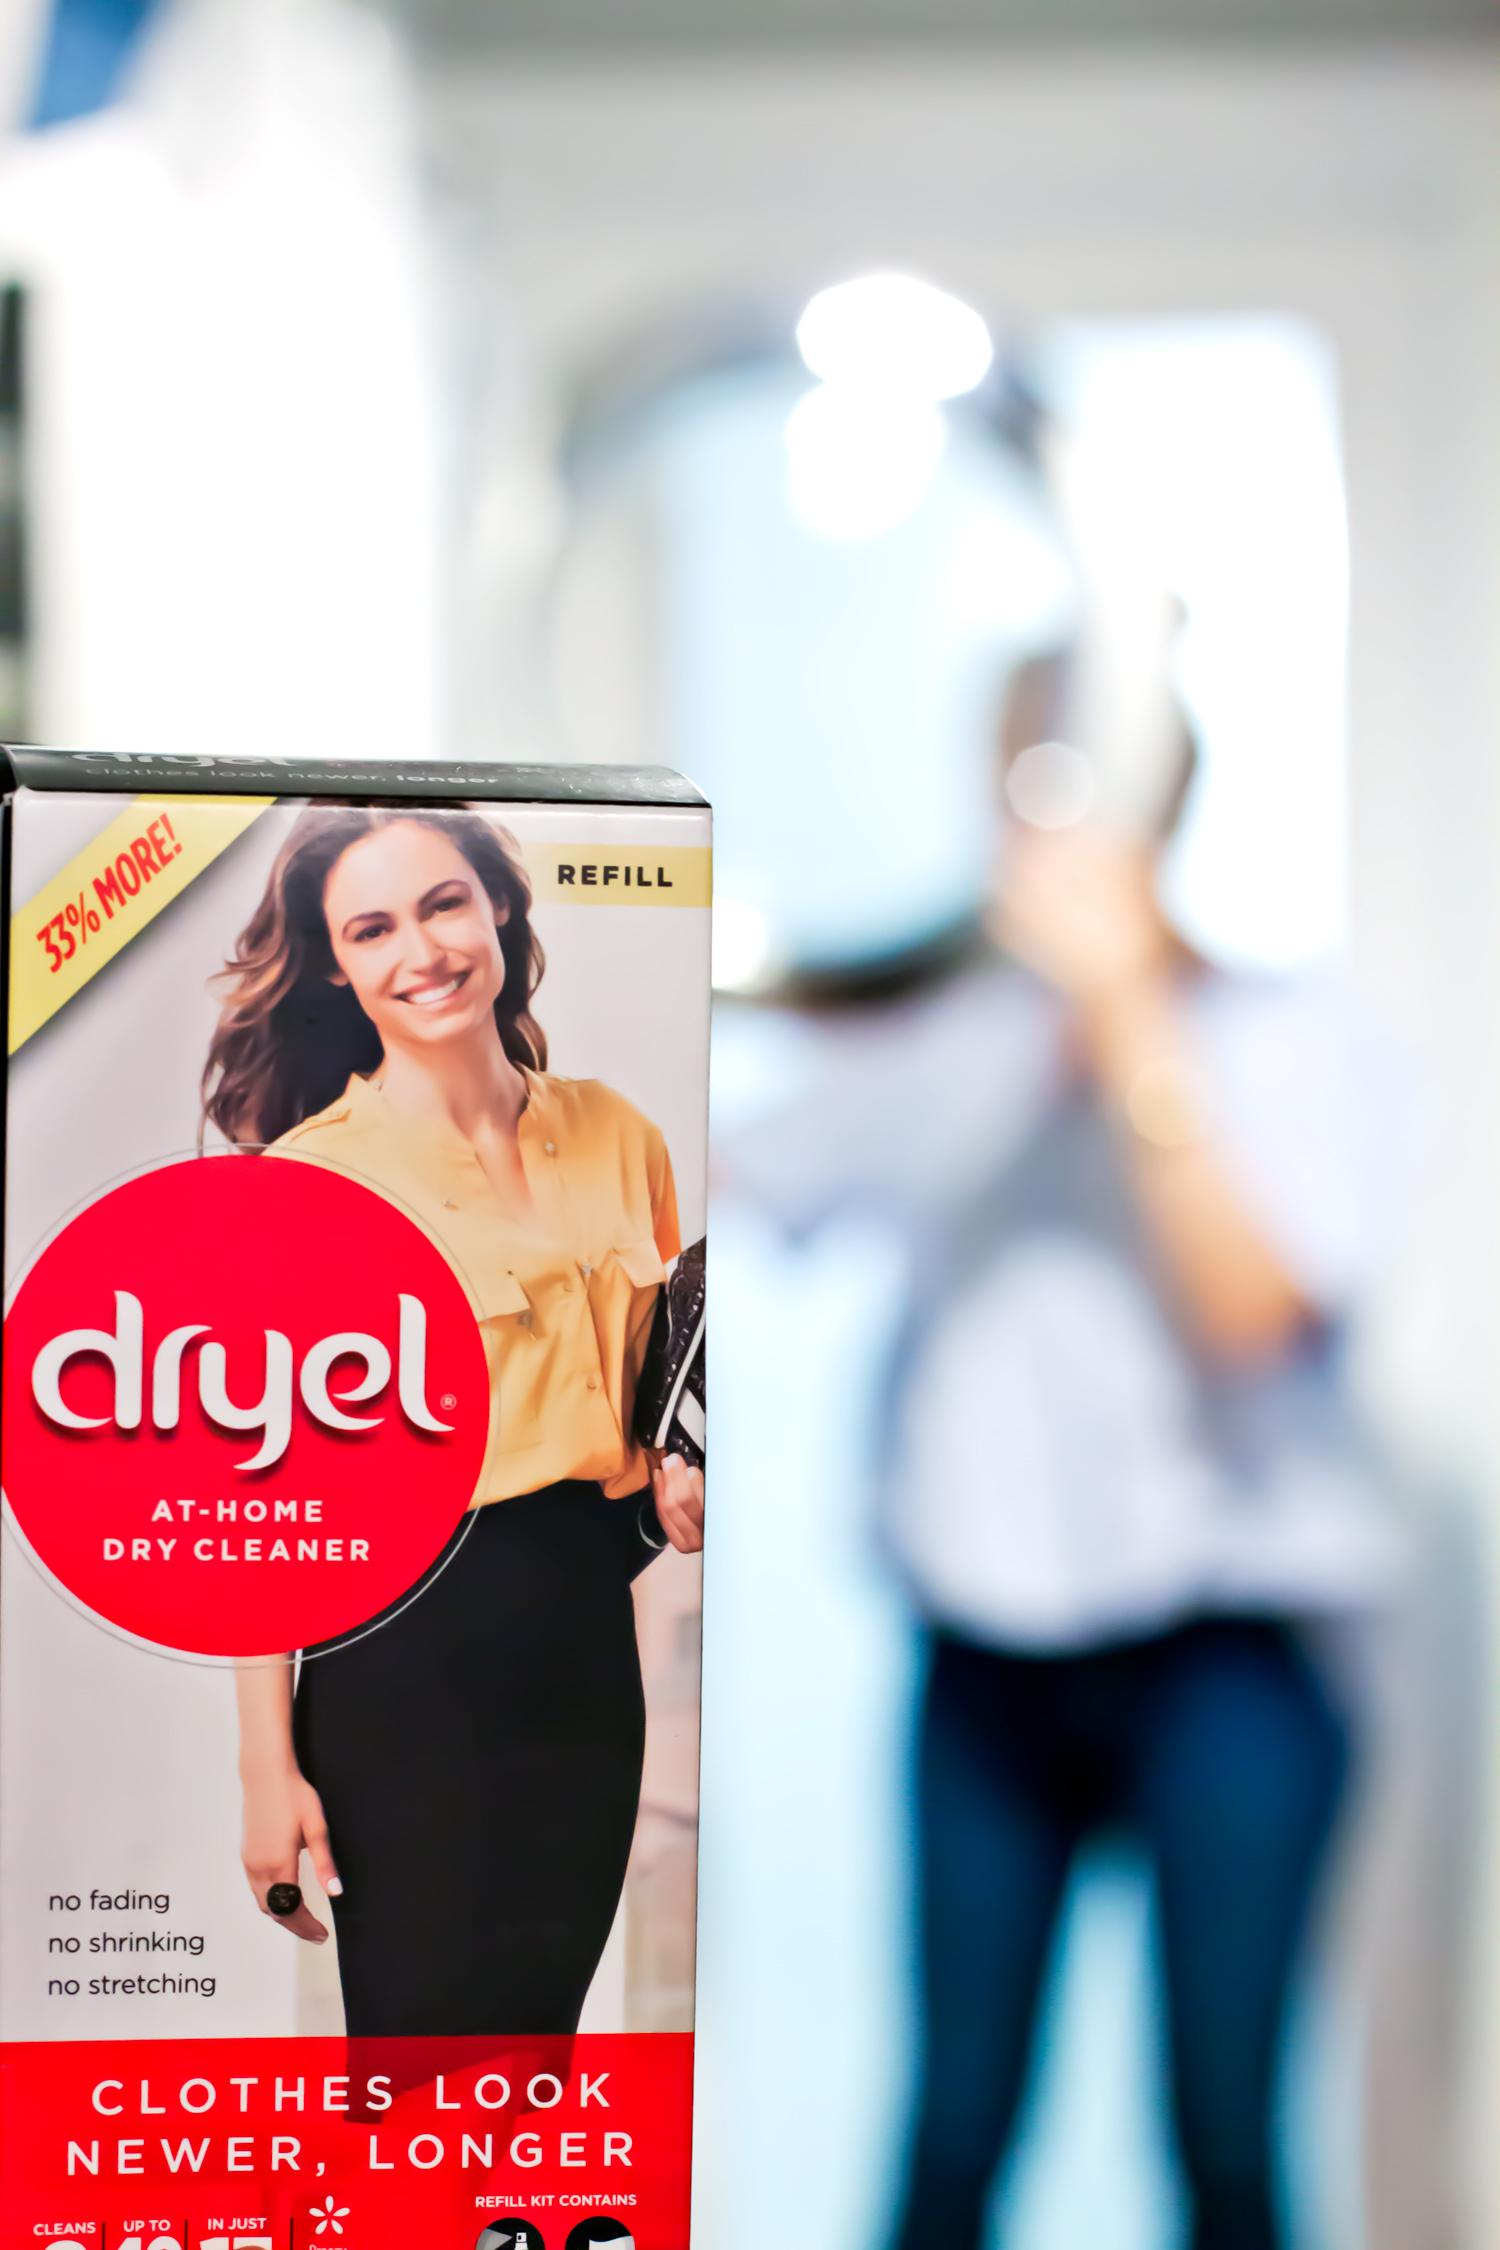 dryel_2